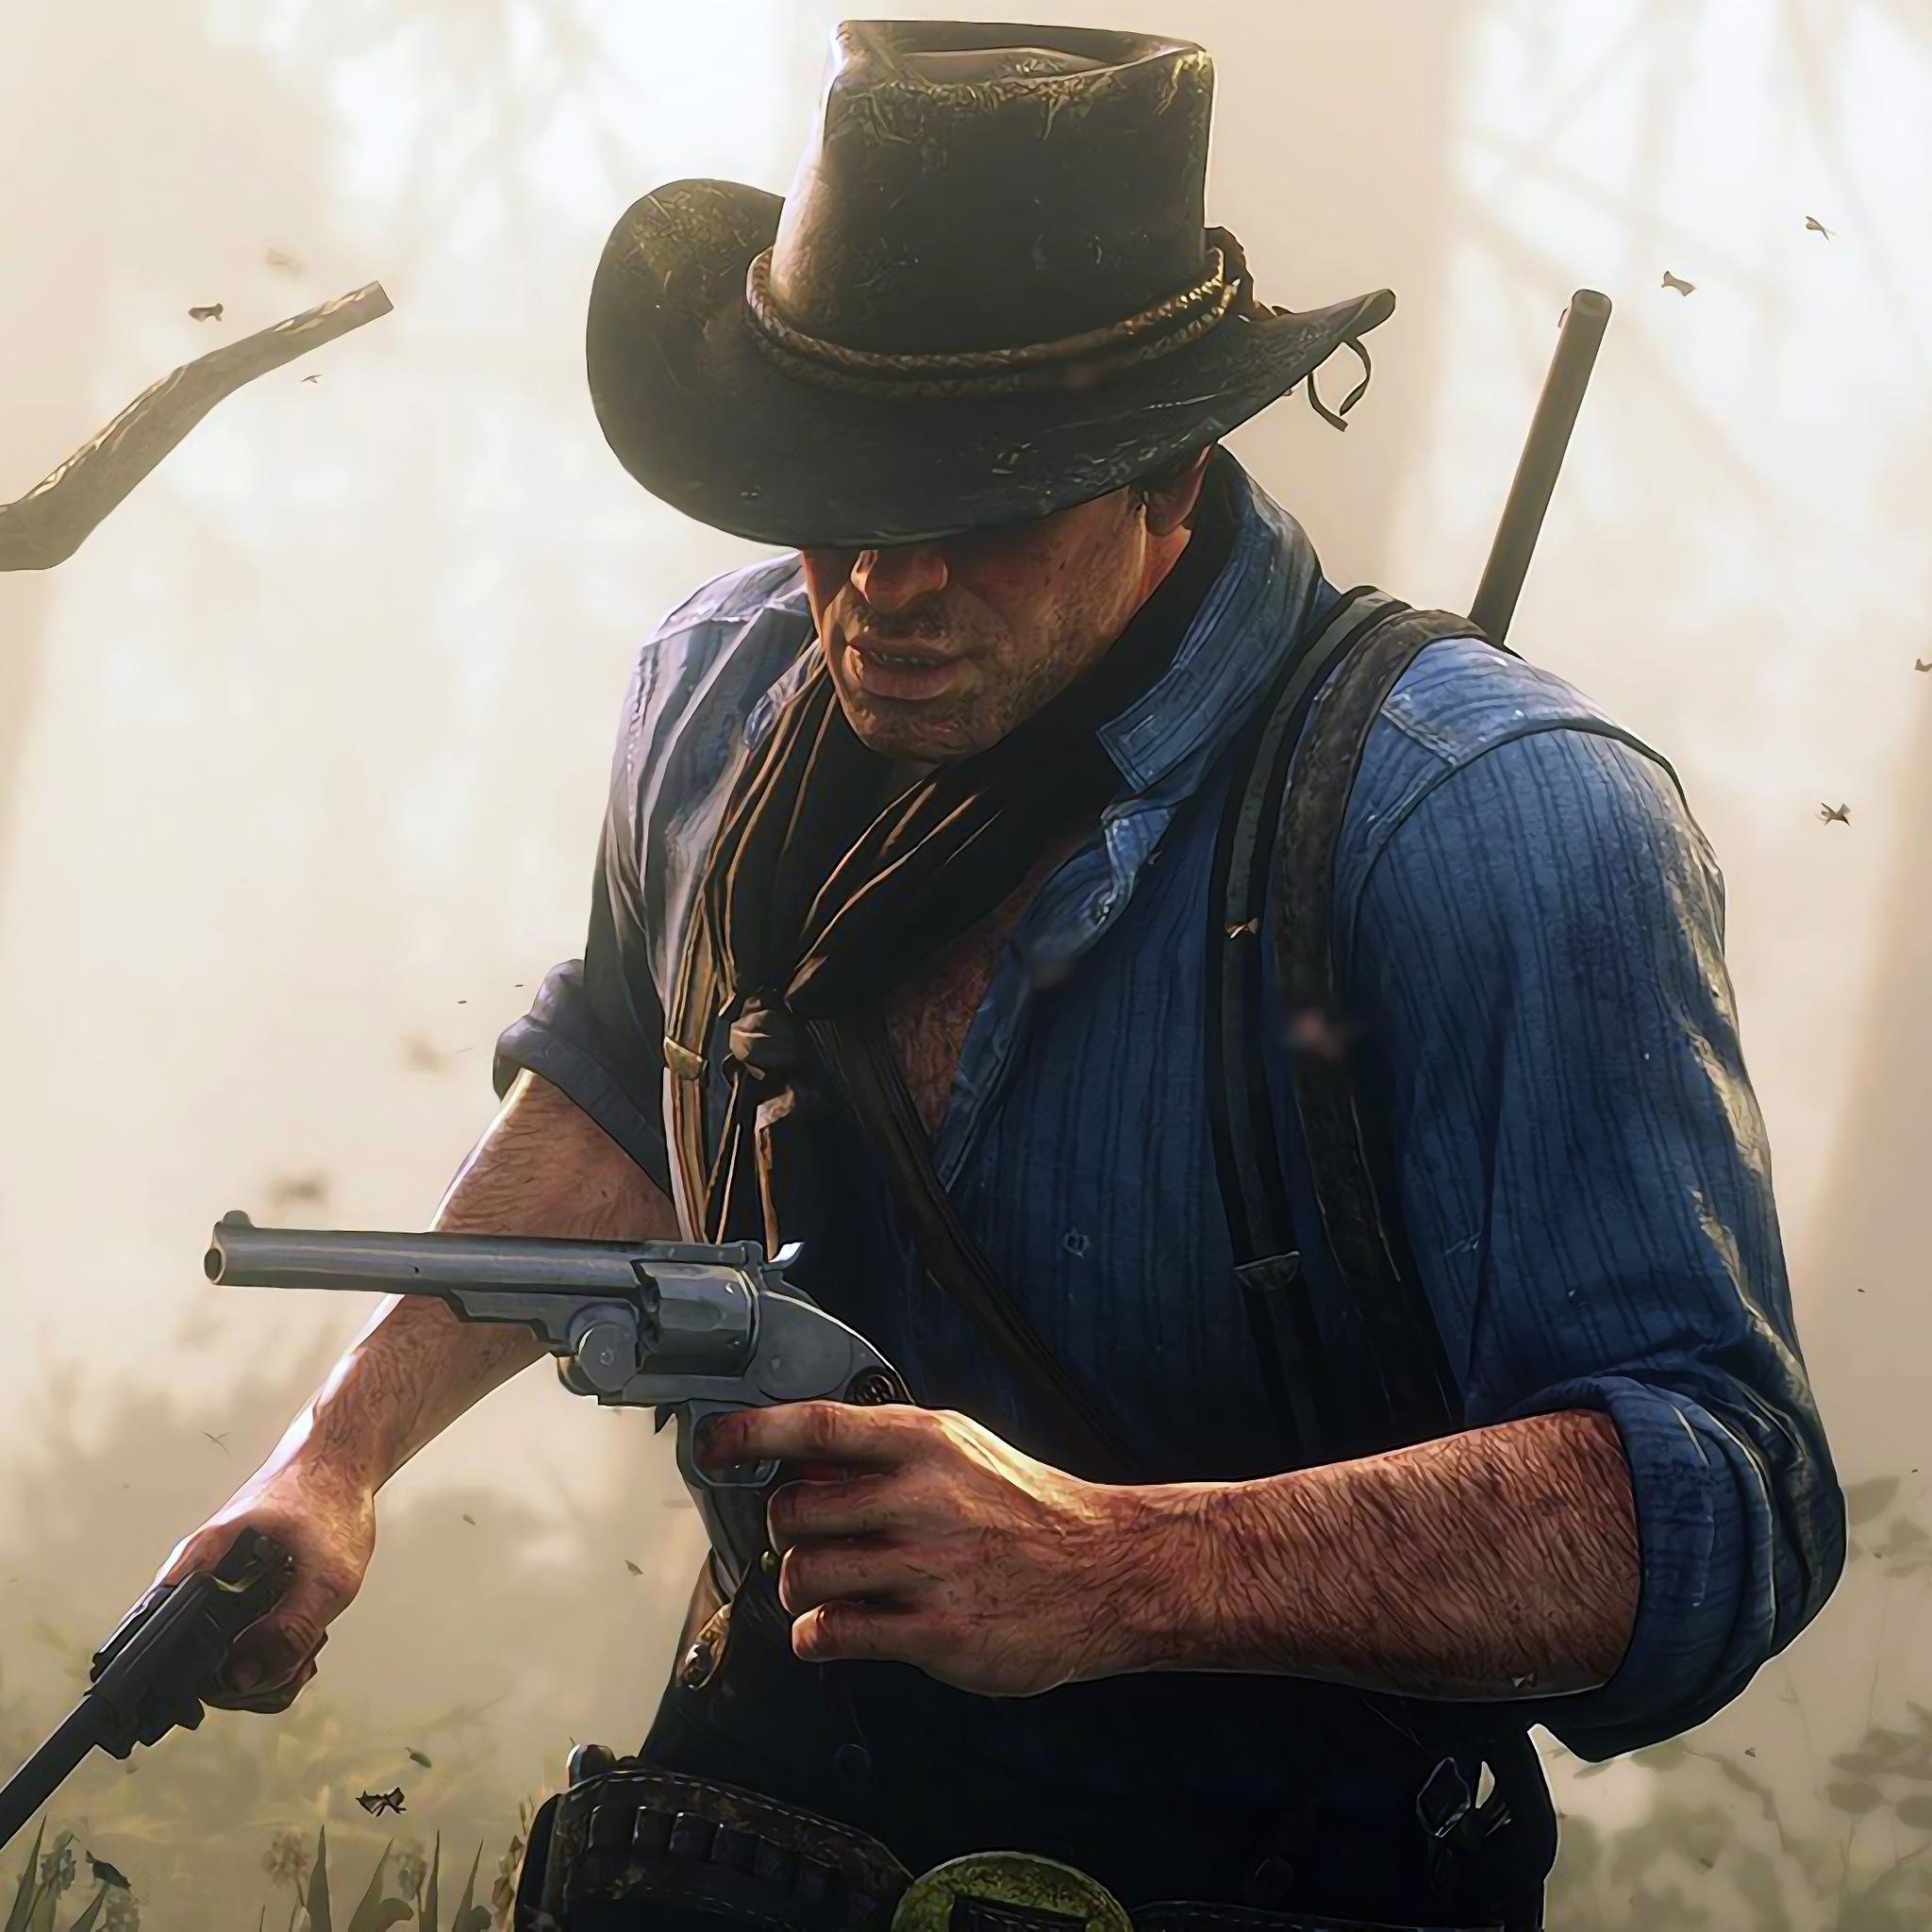 Red Dead Redemption Wallpaper Hd: 2048x2048 Arthur Morgan Red Dead Redemption 2 Ipad Air HD